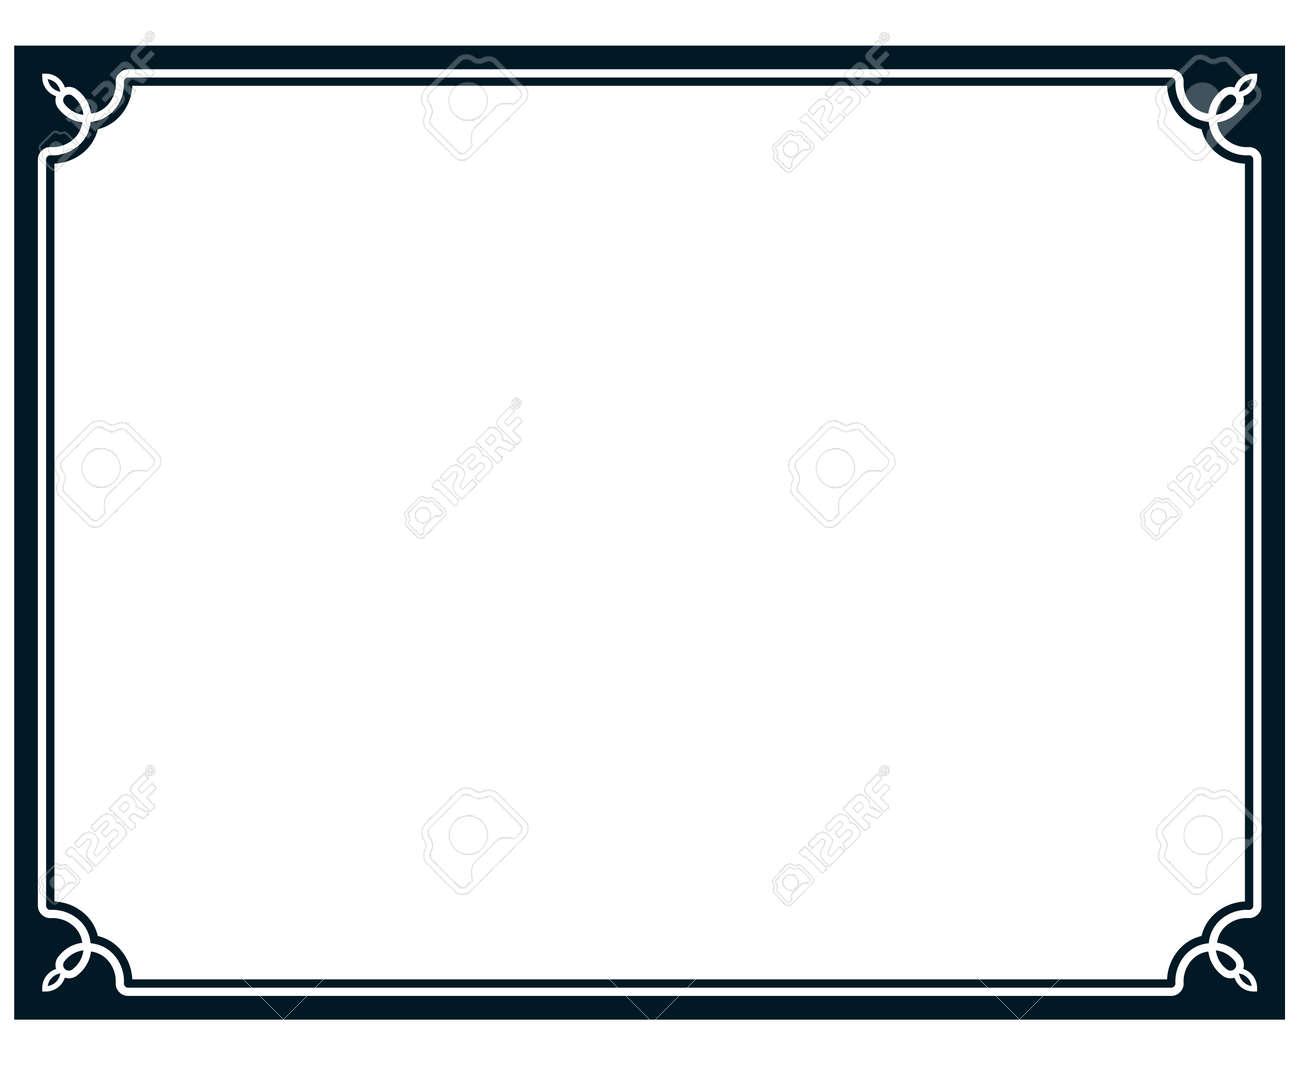 border frame line deco vector label simple royalty free cliparts rh 123rf com border vector images border vector images